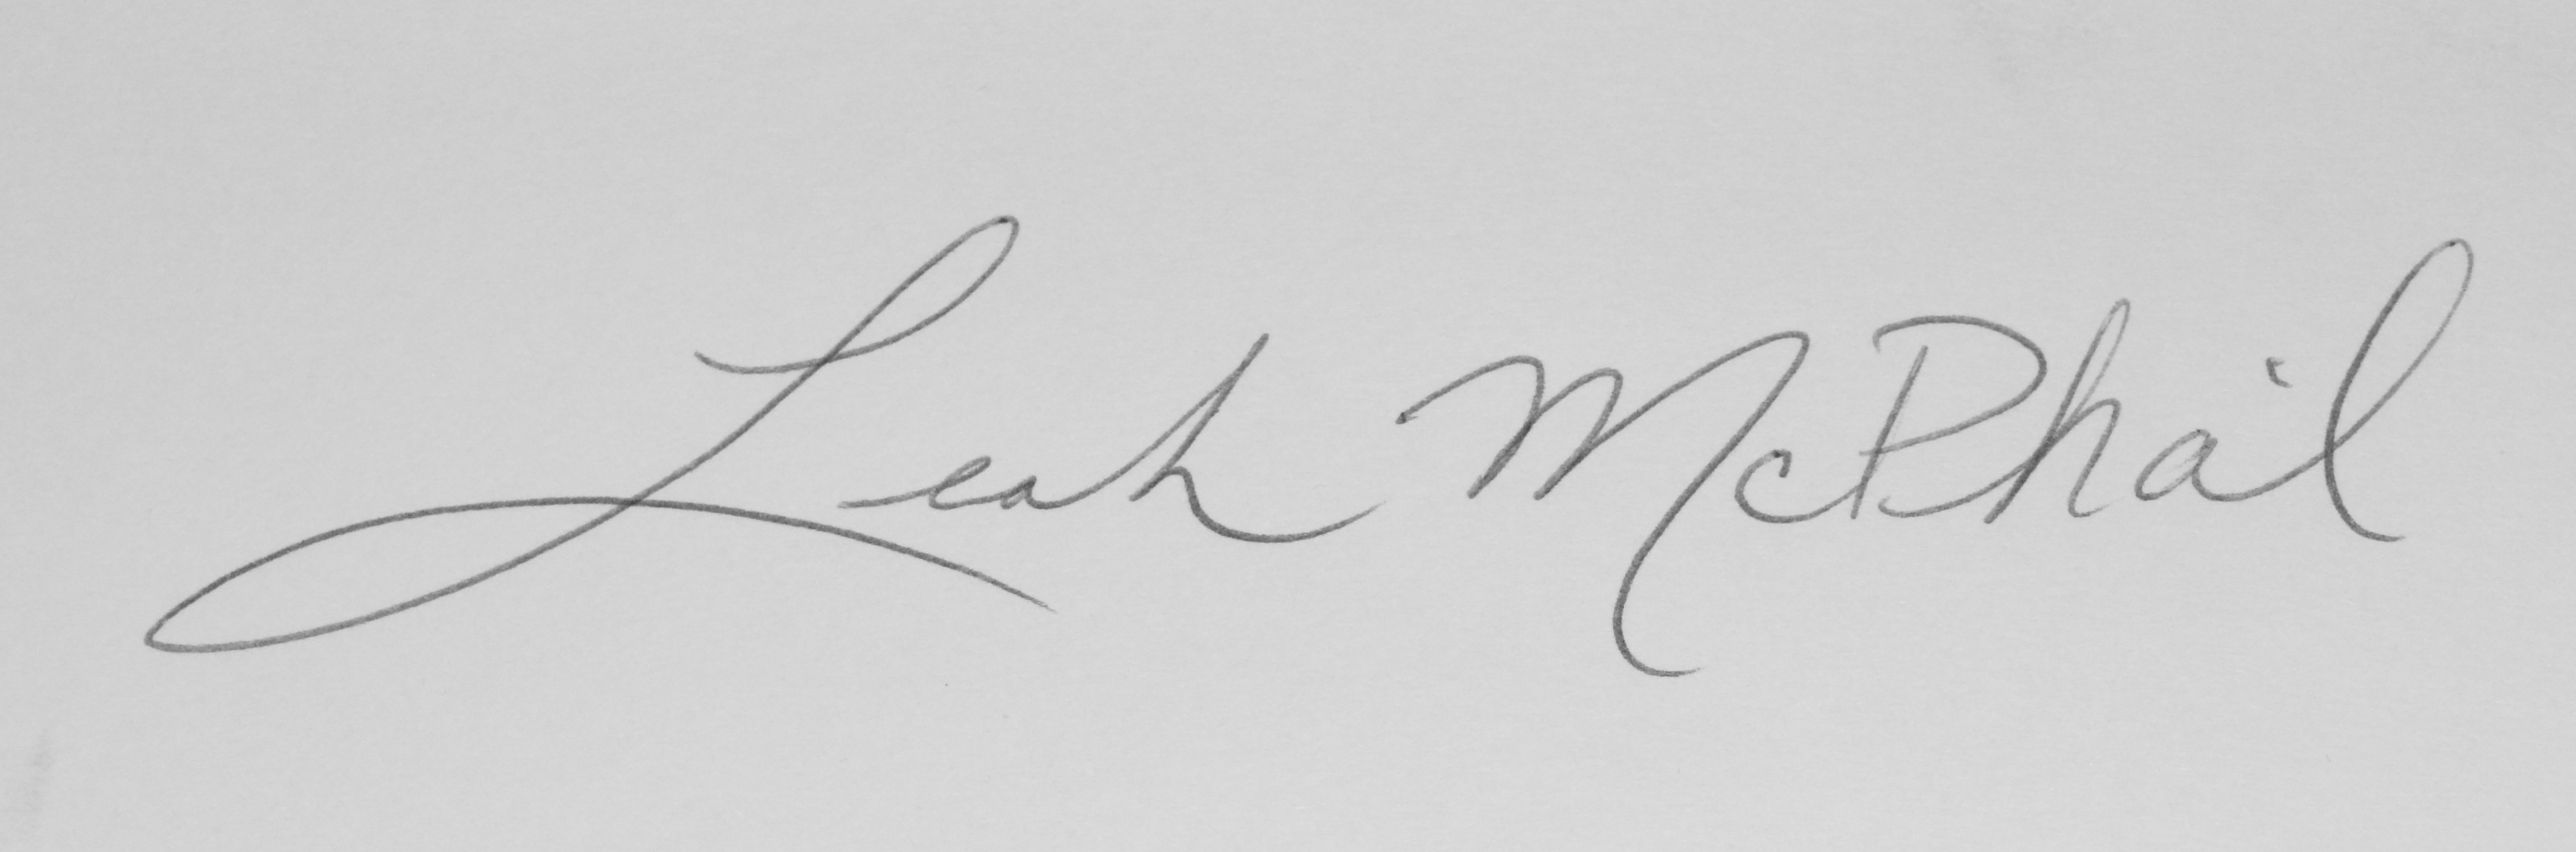 Leah McPhail Signature